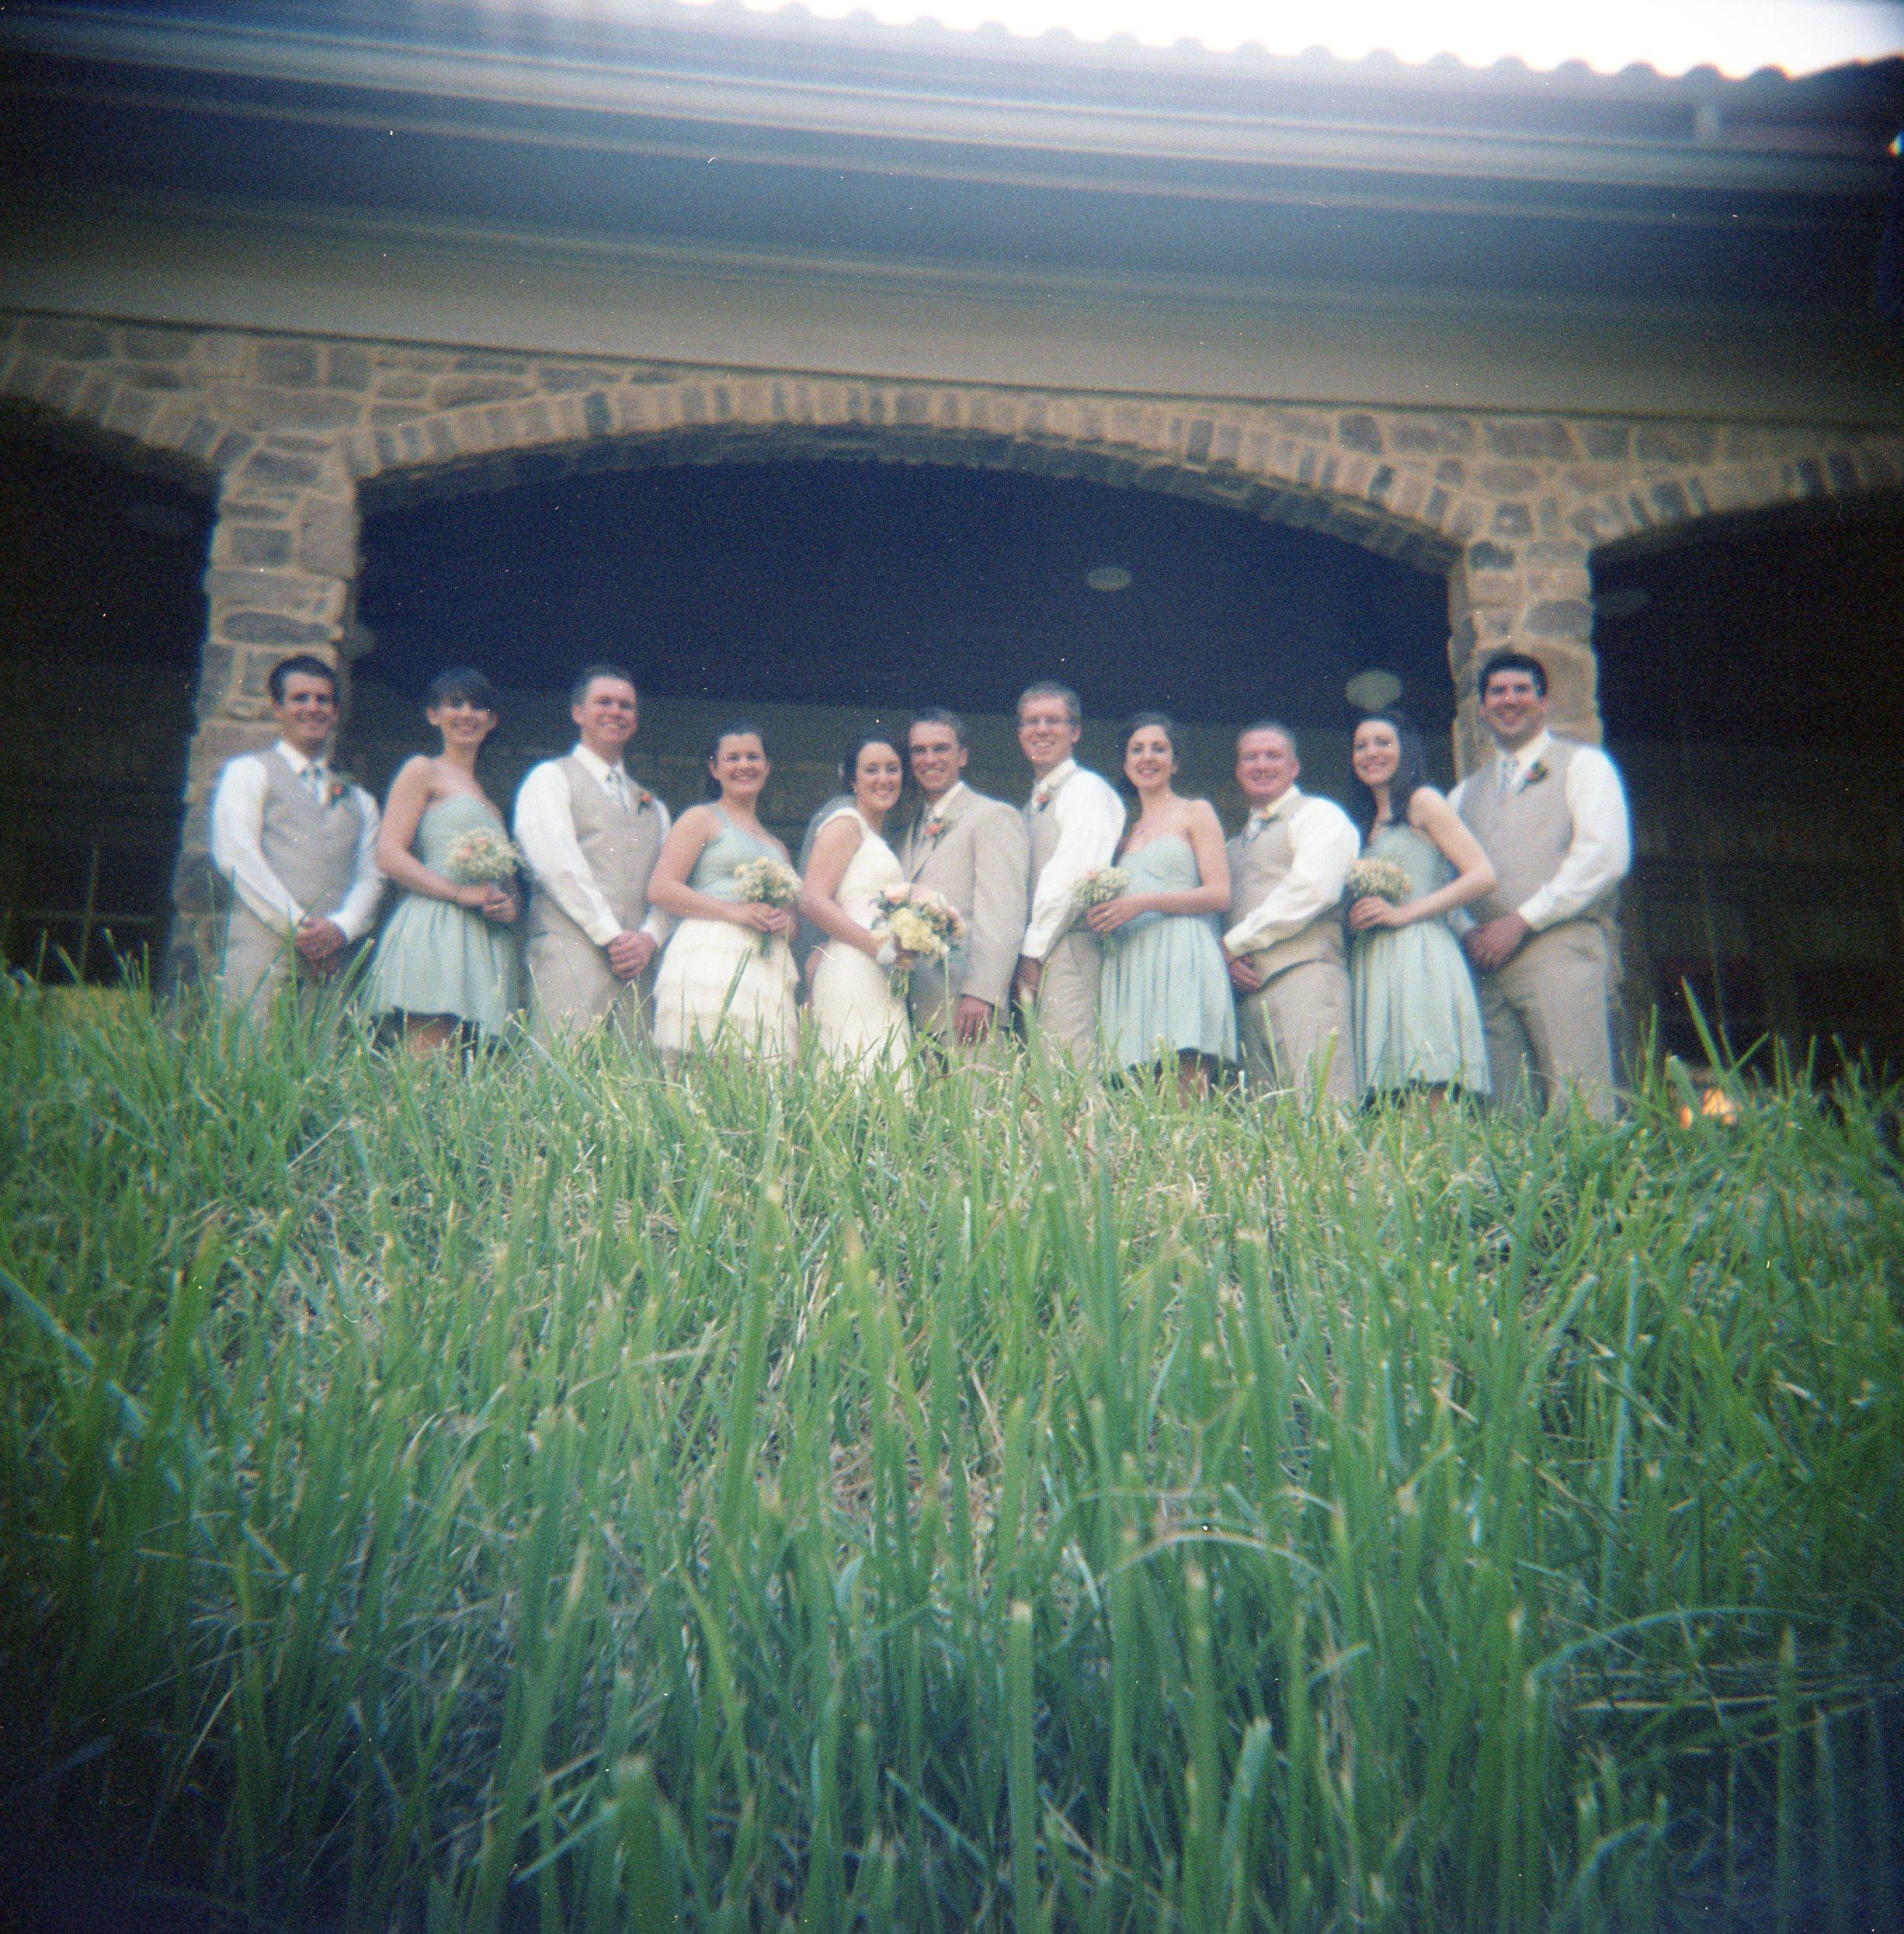 wedding_holgas007.jpg